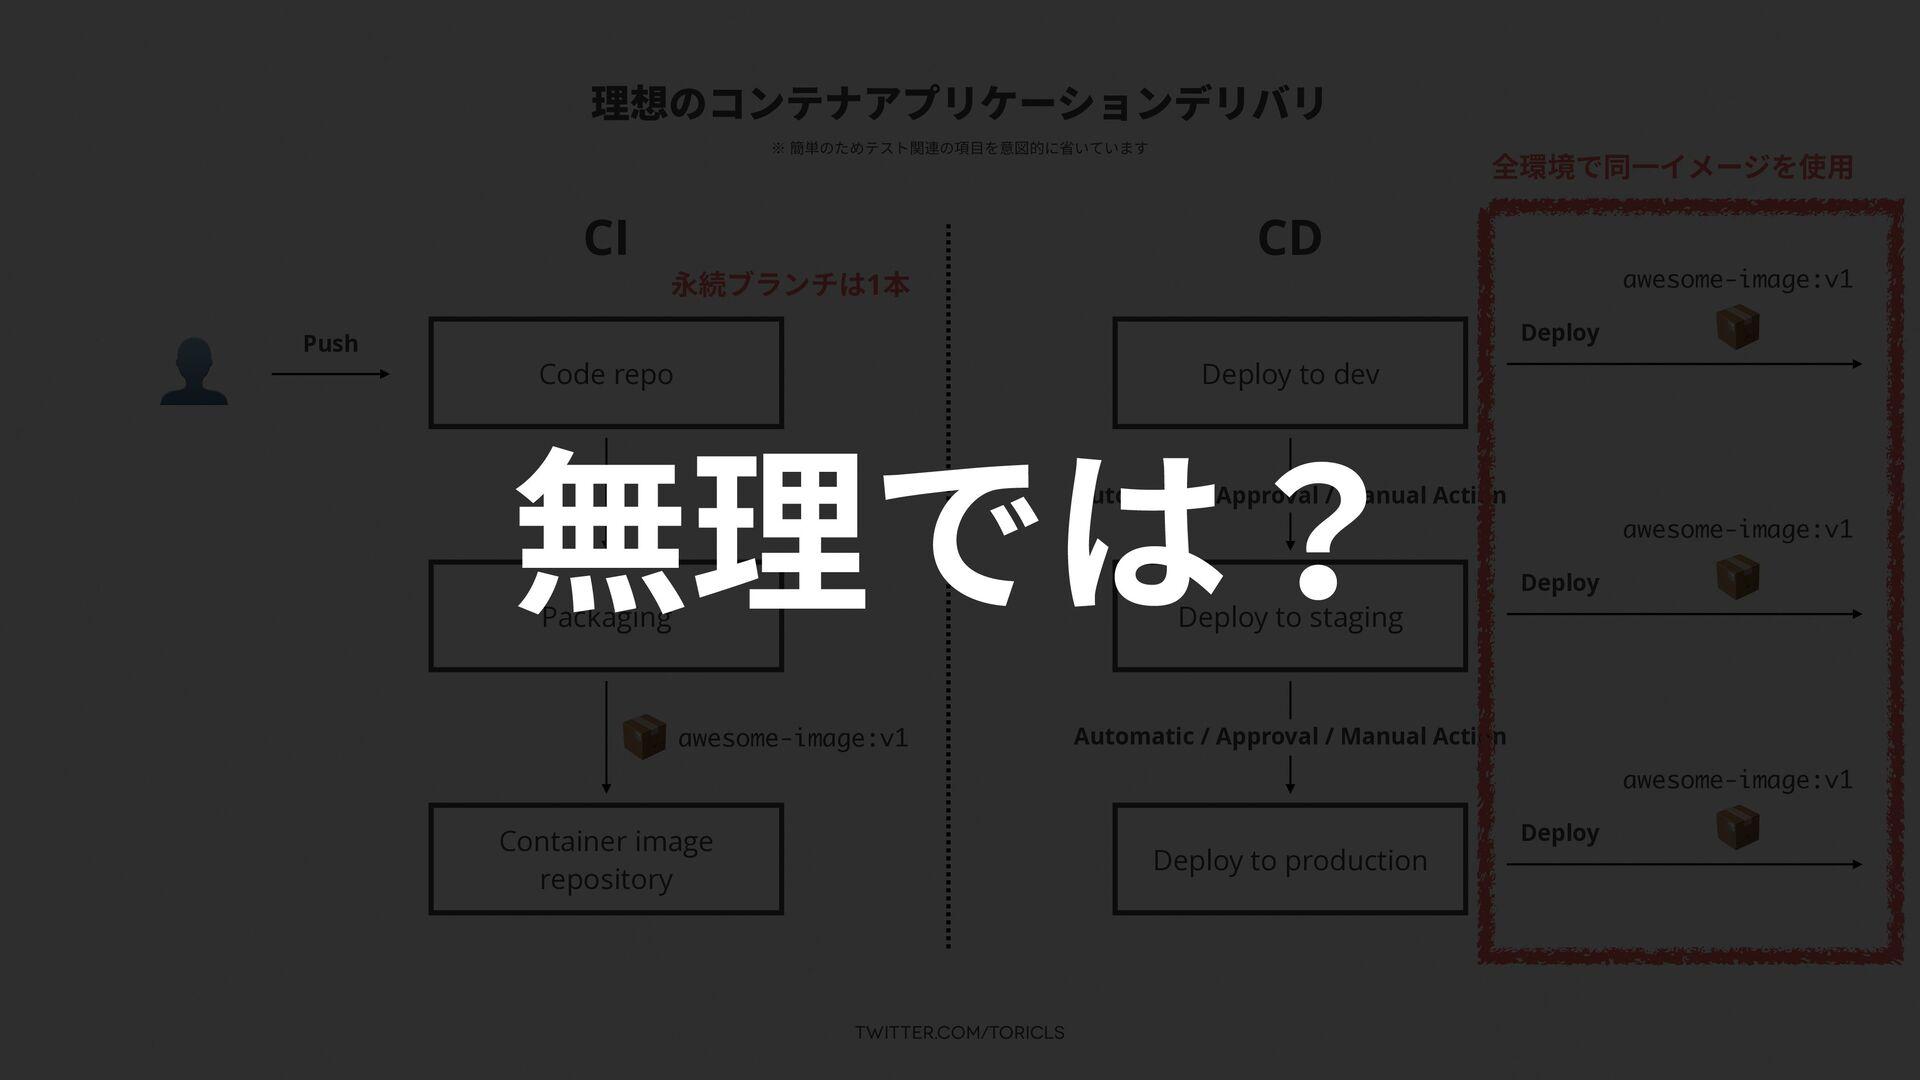 twitter.com/toricls 理想のコンテナアプリケーションデリバリ CI CD 👤...